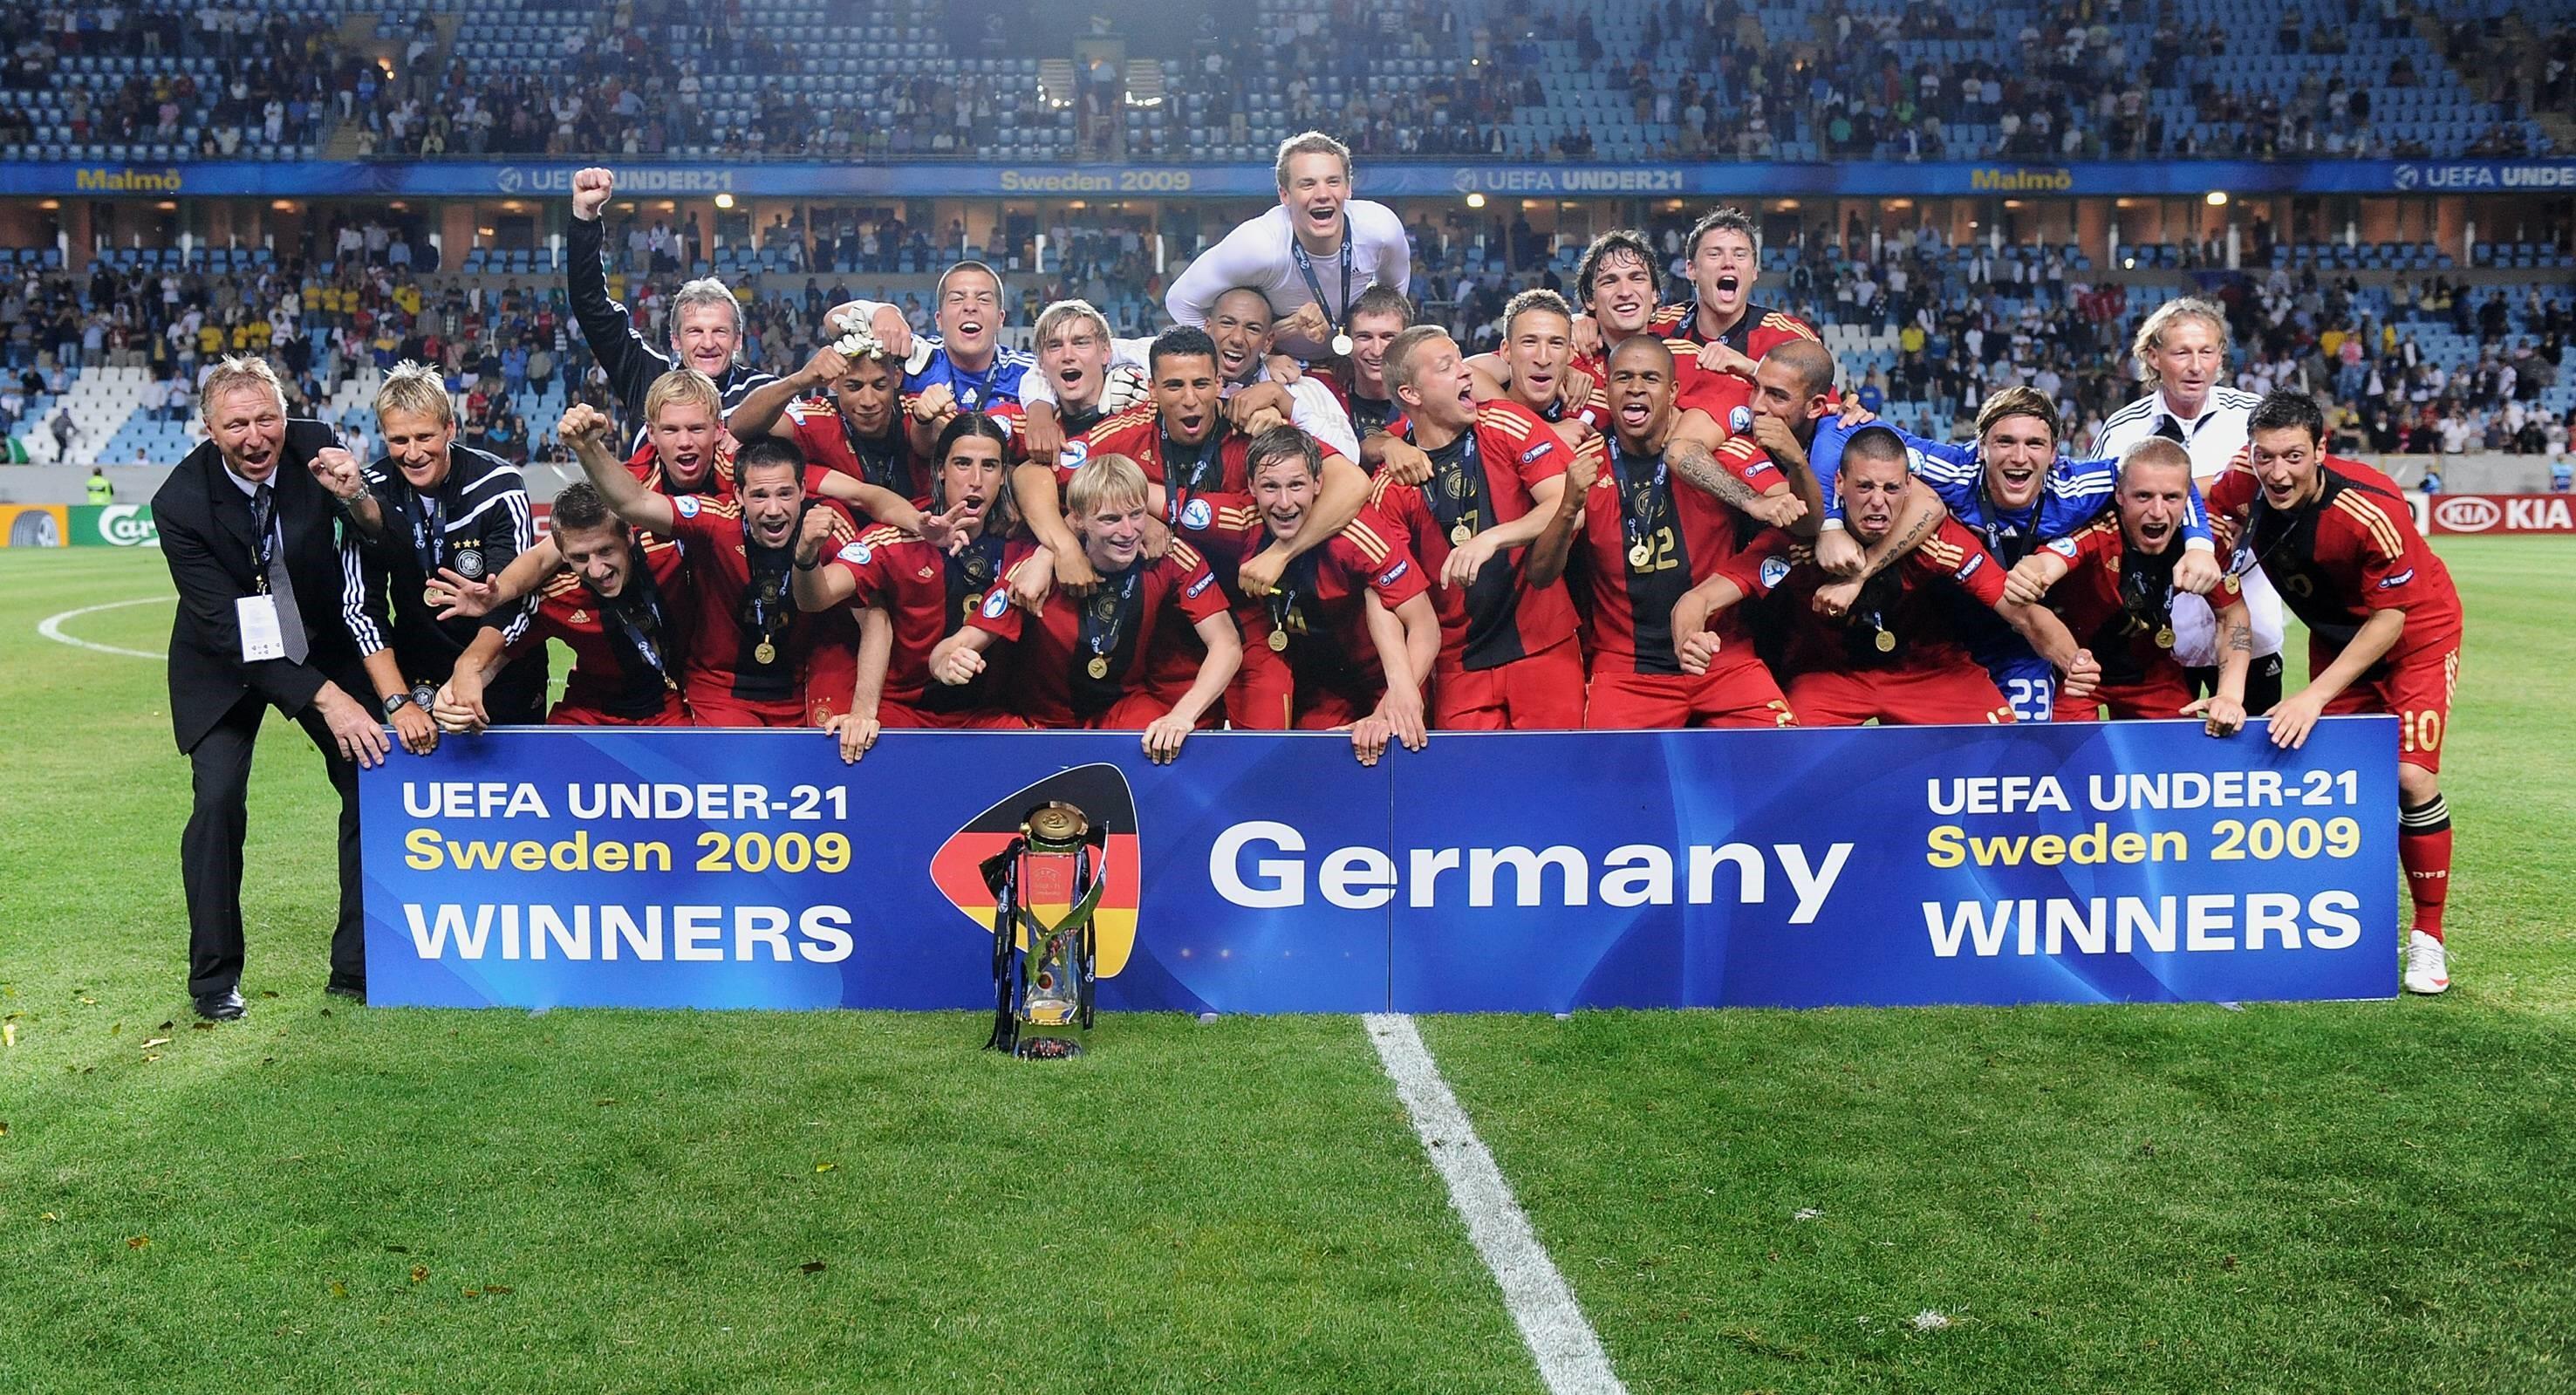 Германия U-21 2009